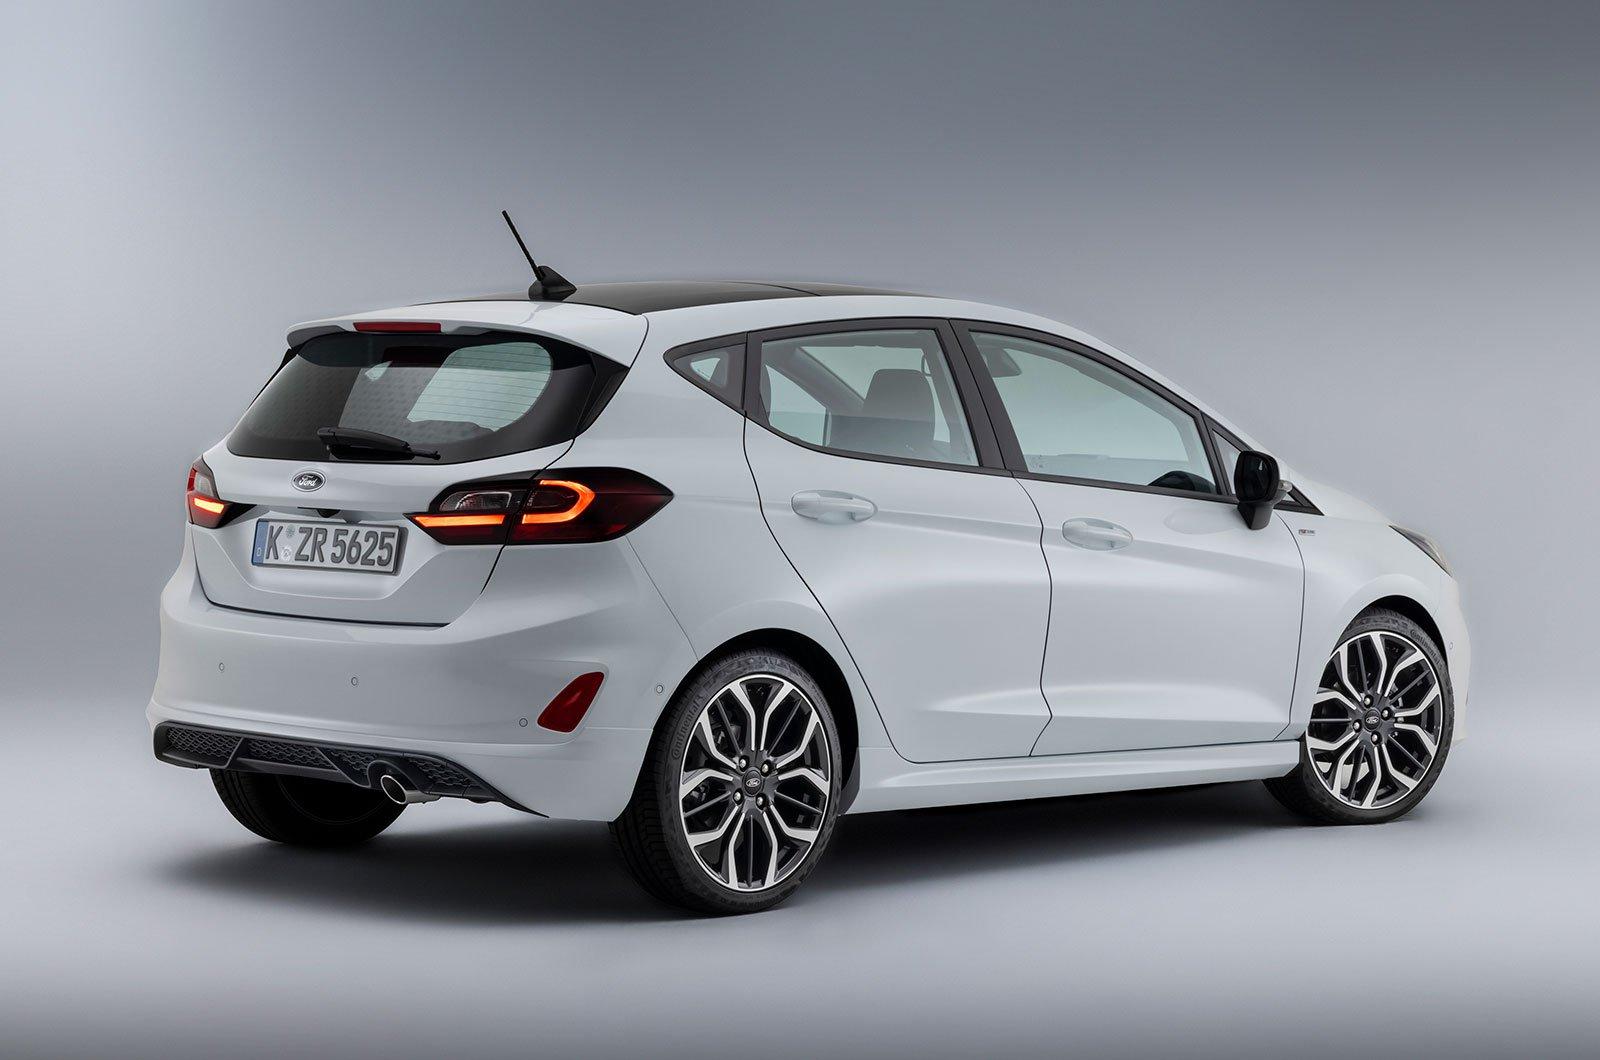 2022 Ford Fiesta rear